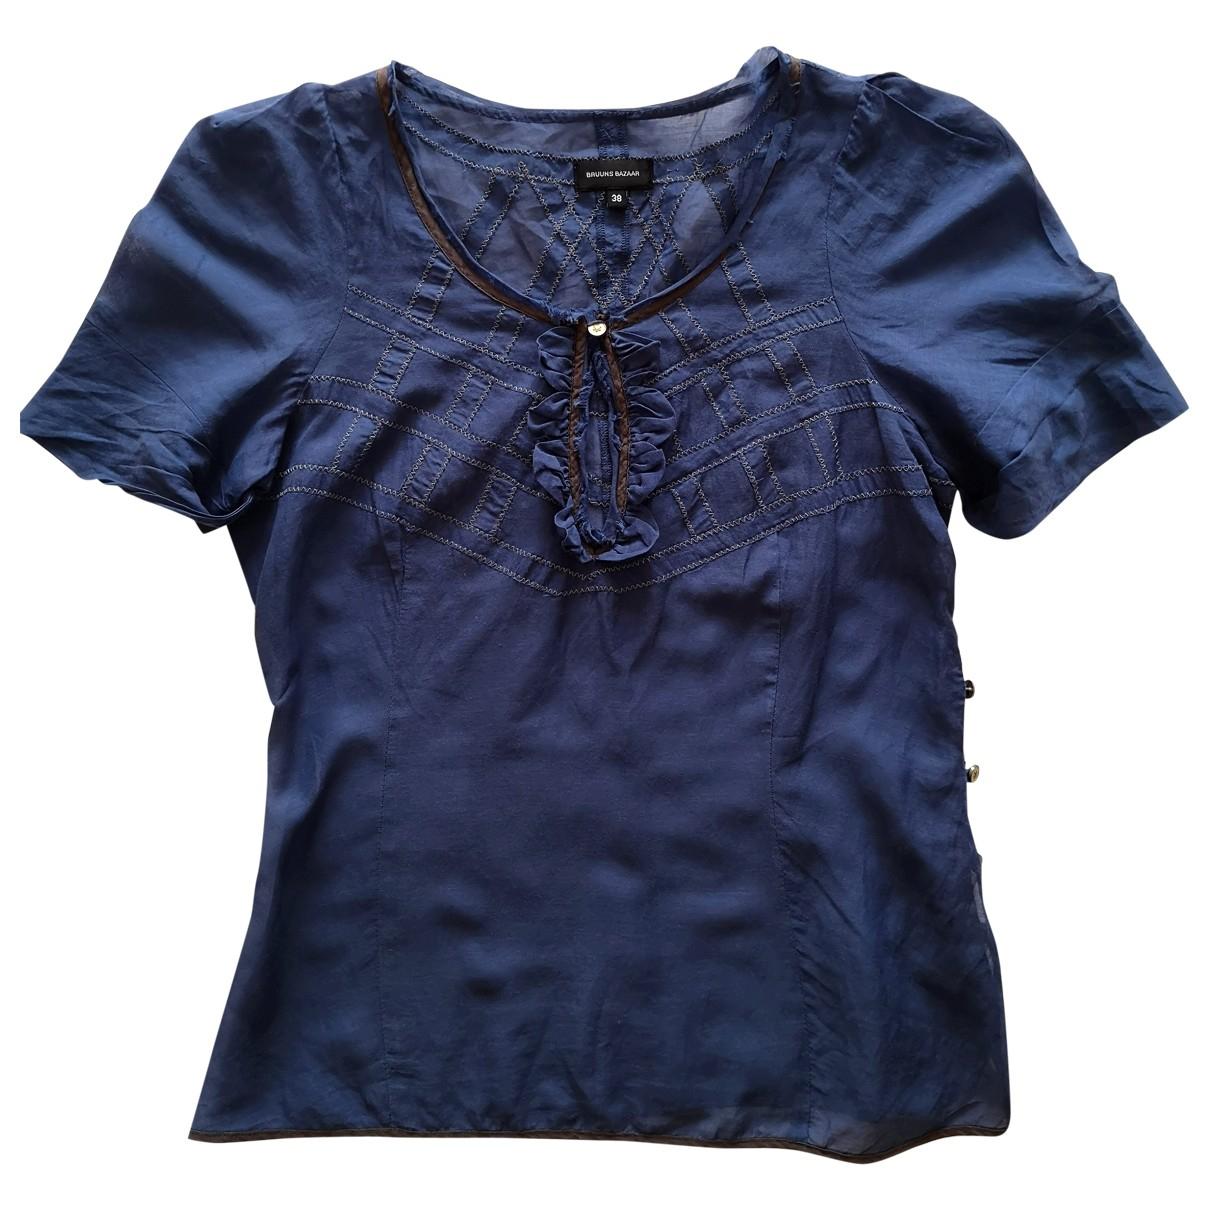 Bruuns Bazaar - Top   pour femme - bleu